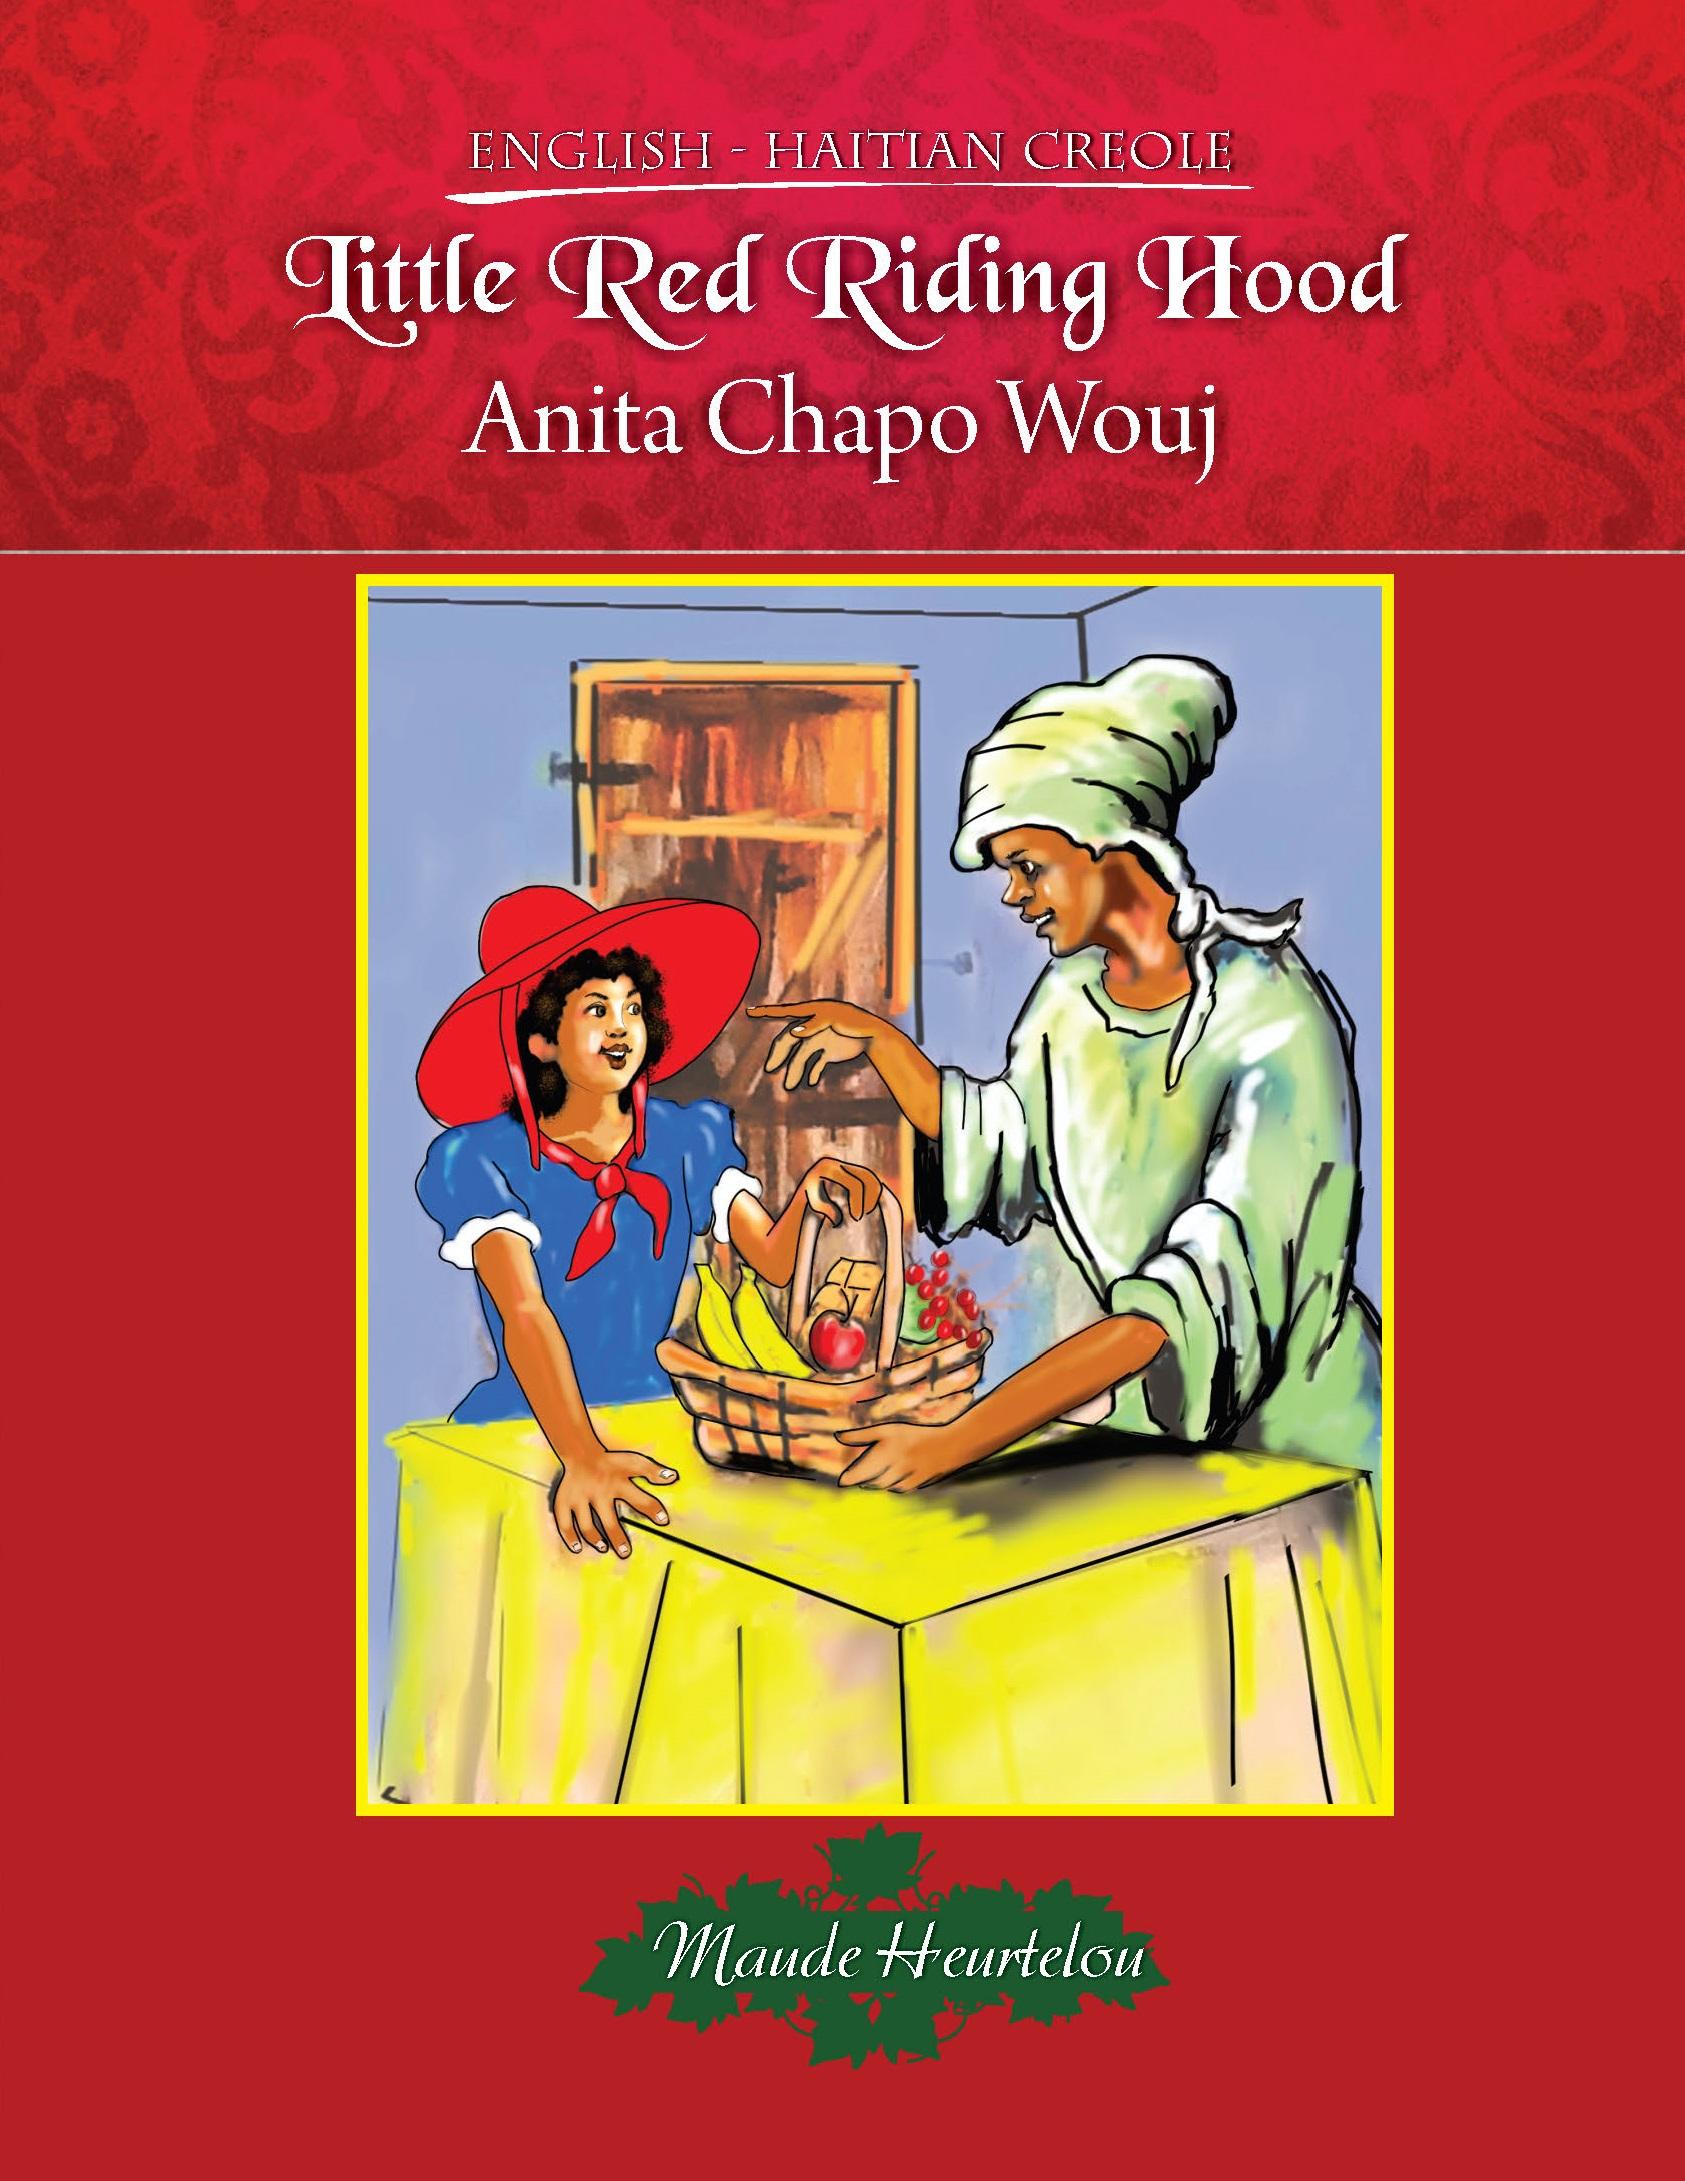 Little Red Riding Hood / Anita Chapo Wouj